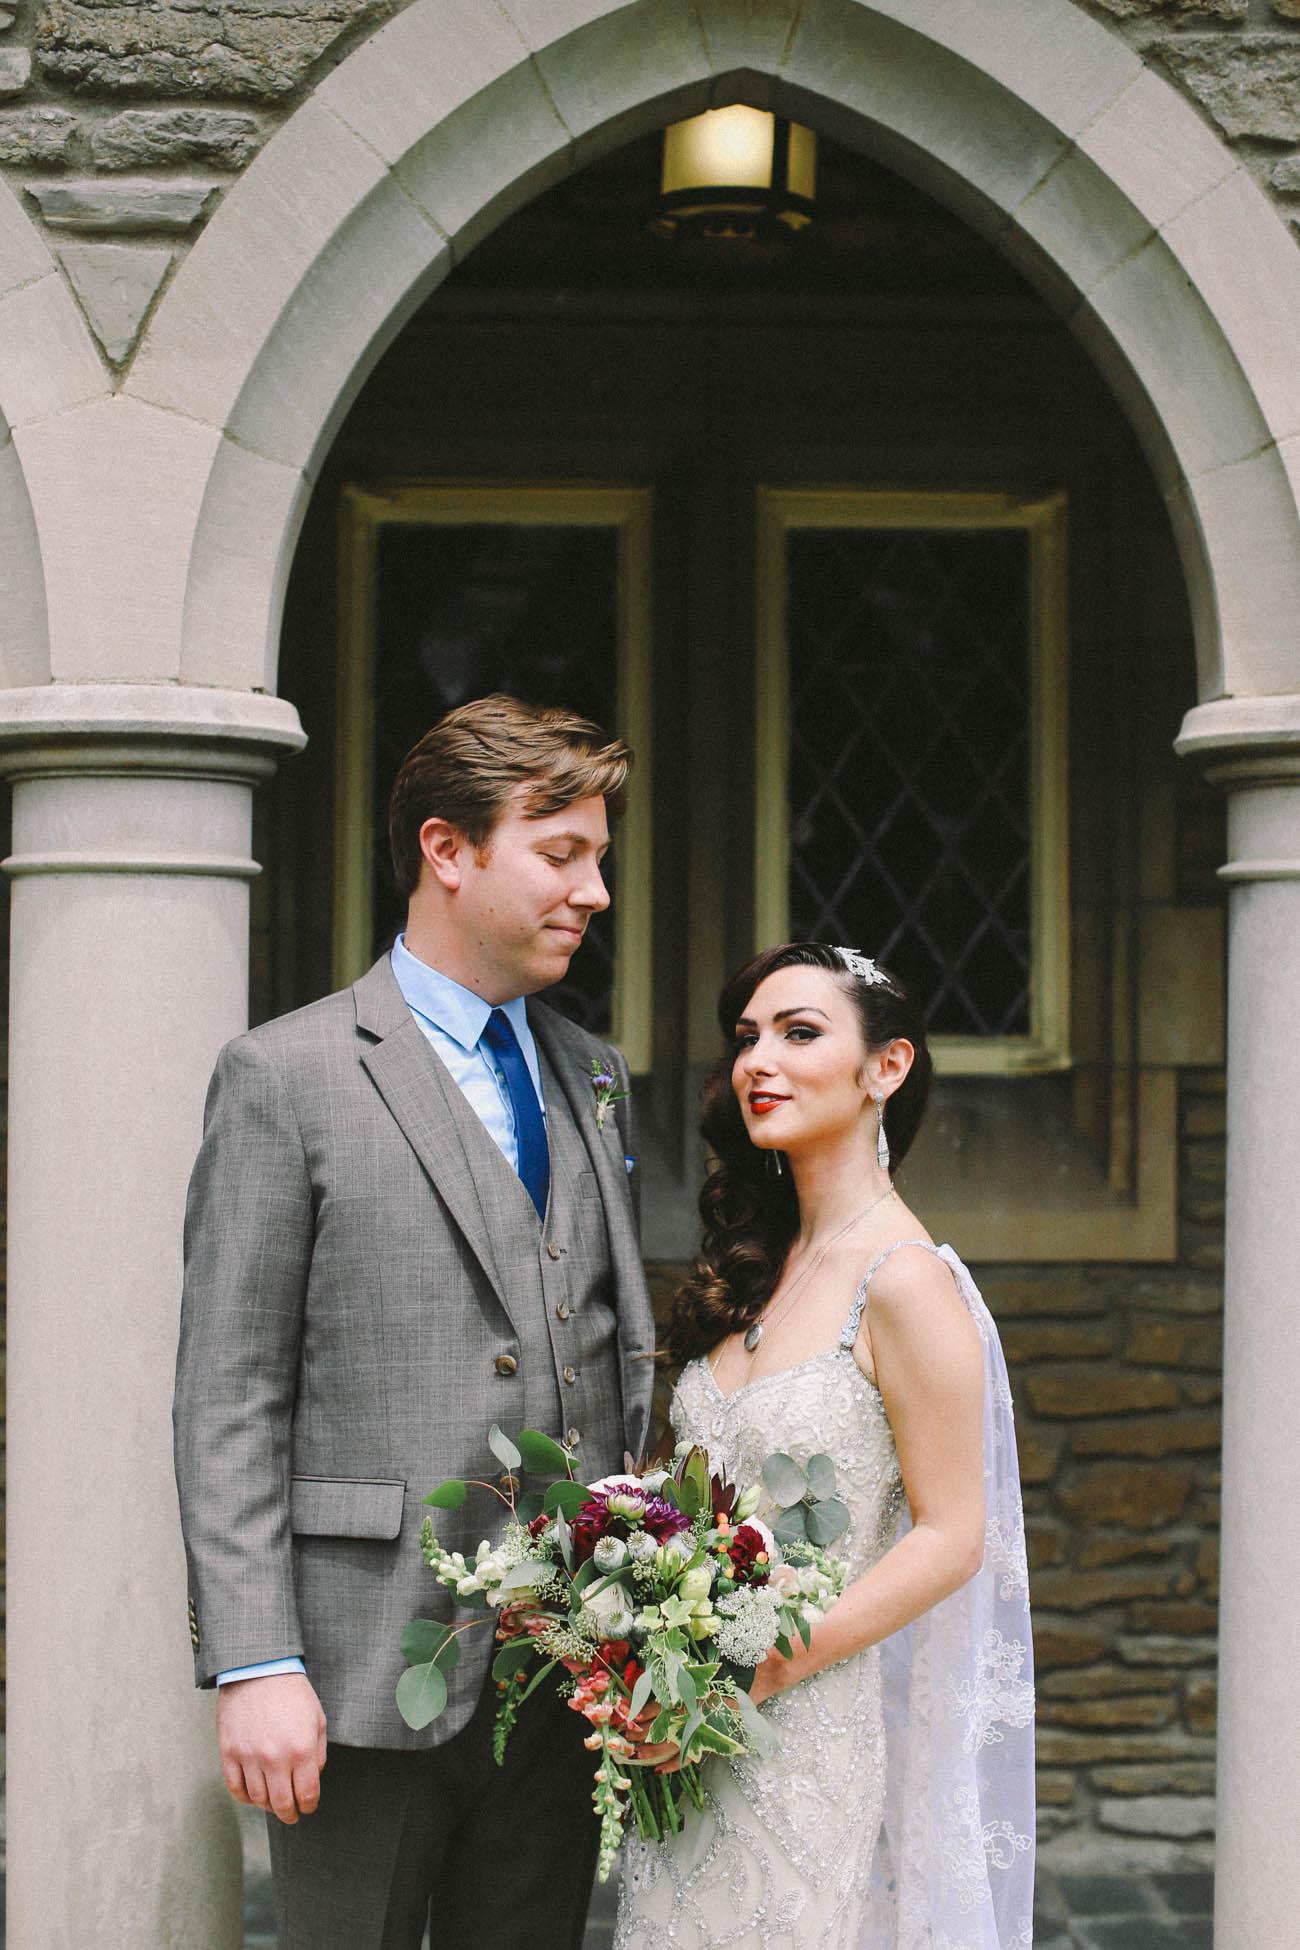 Speakeasy-1920s-theme-Louisville-and-Lexington Wedding-59.jpg